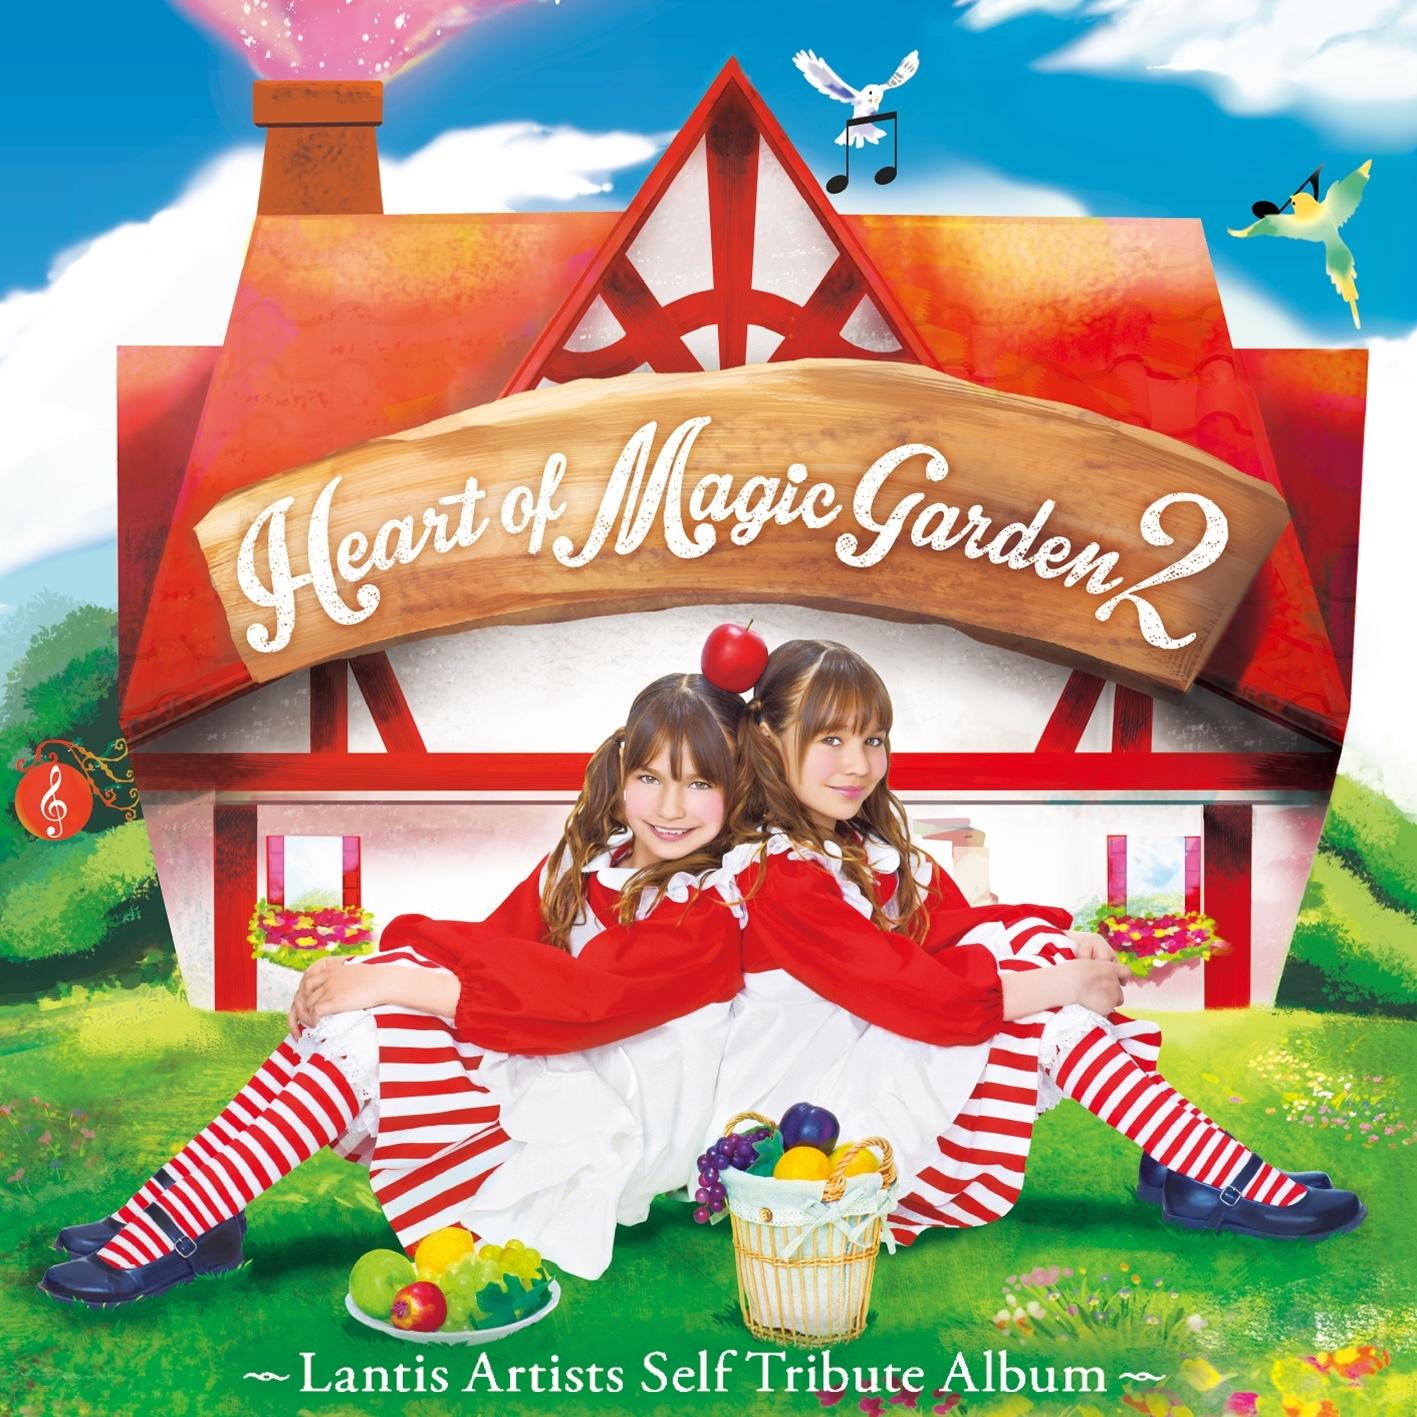 Heart of Magic Garden2